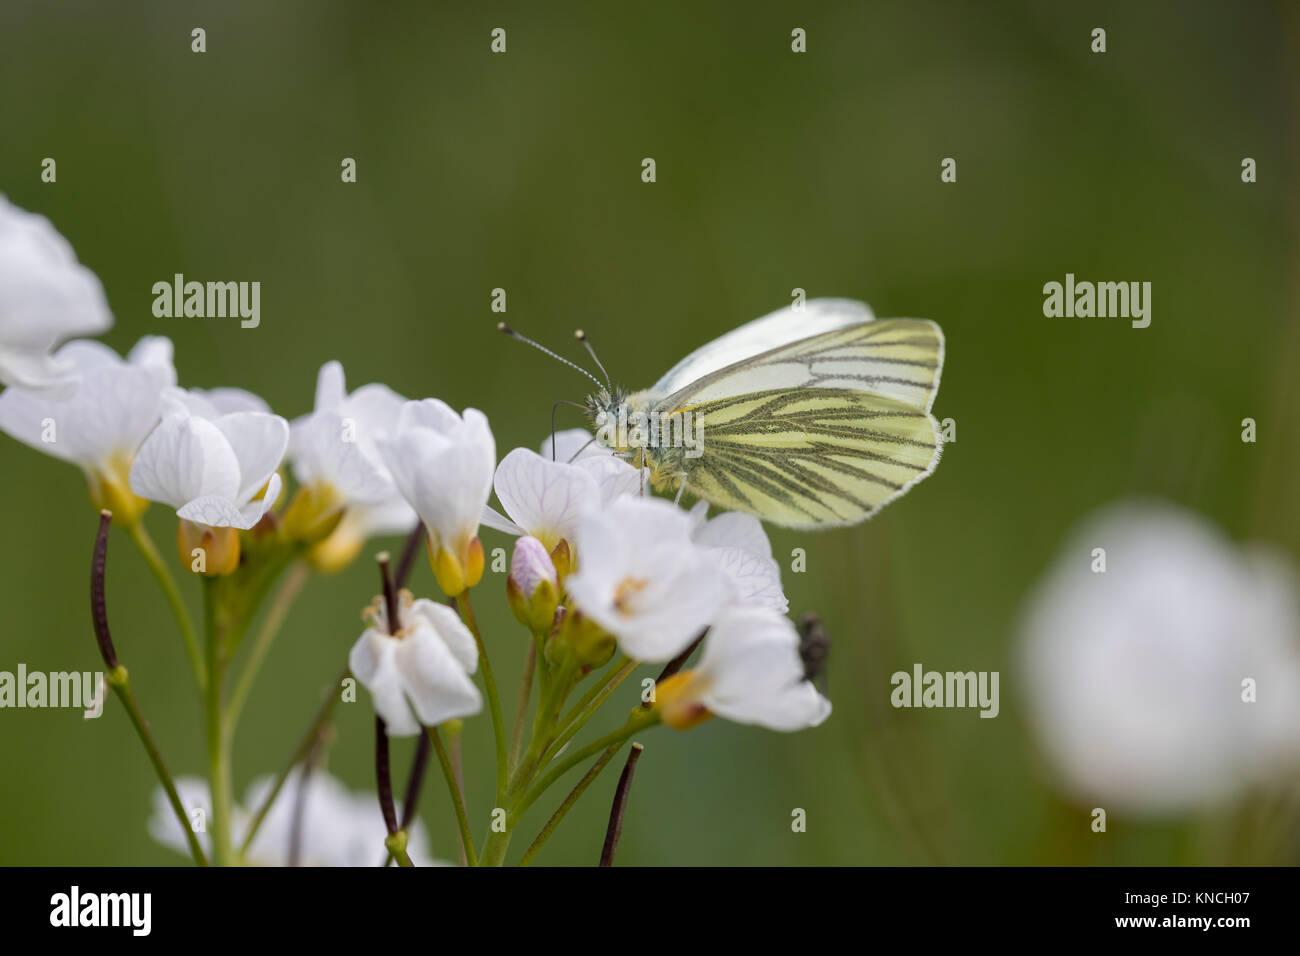 Green Veined White Butterfly; Pieris napi Single on Flower Lancashire; UK - Stock Image